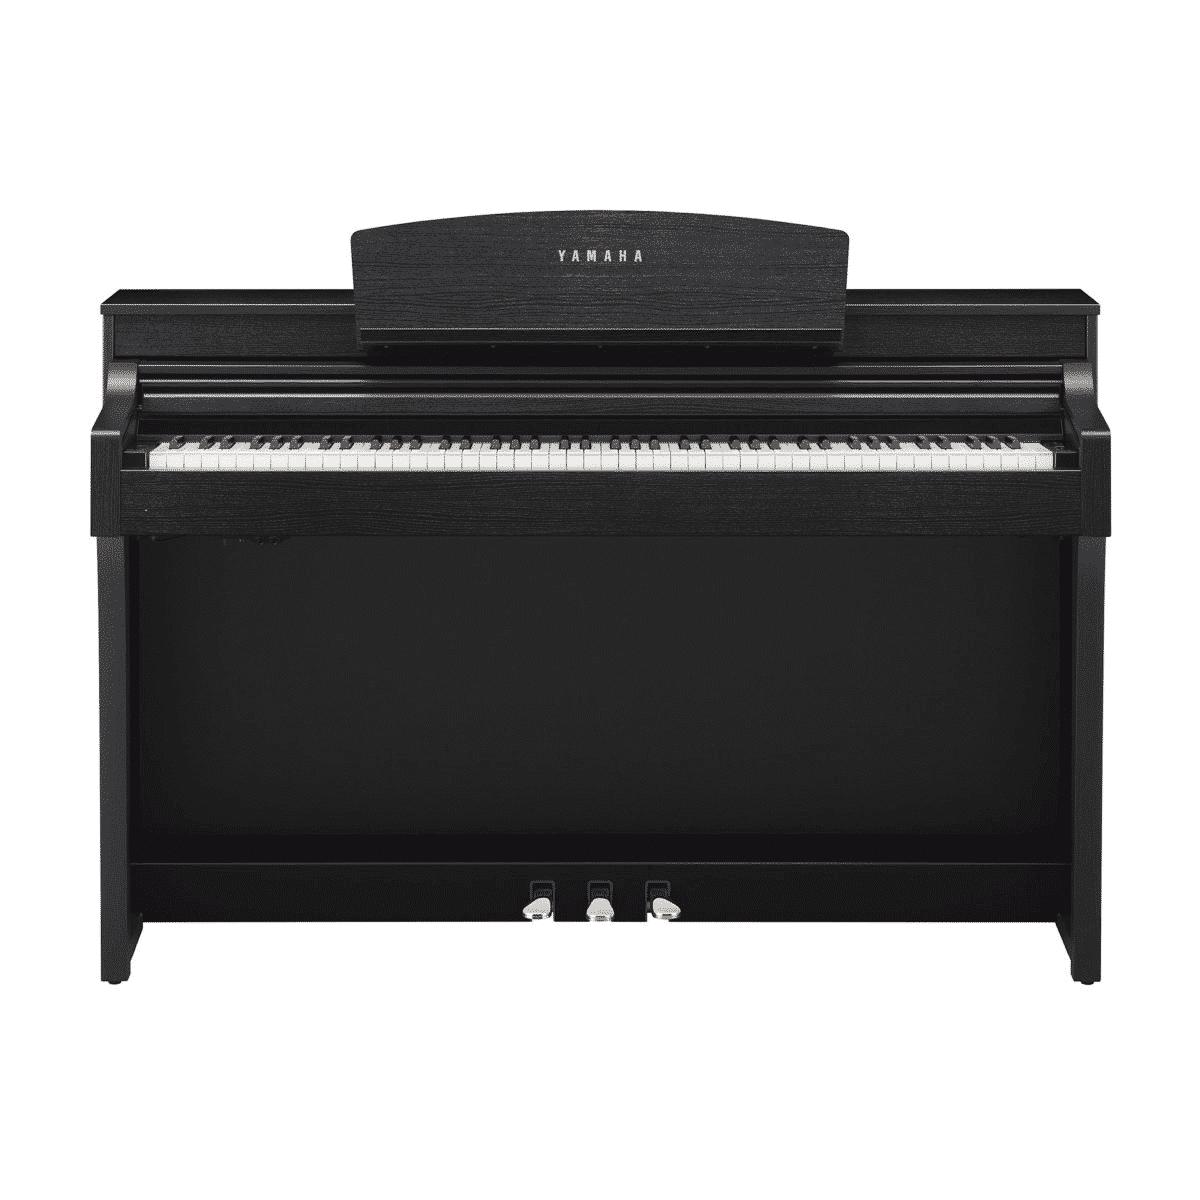 Yamaha Clavinova CSP150 in Black